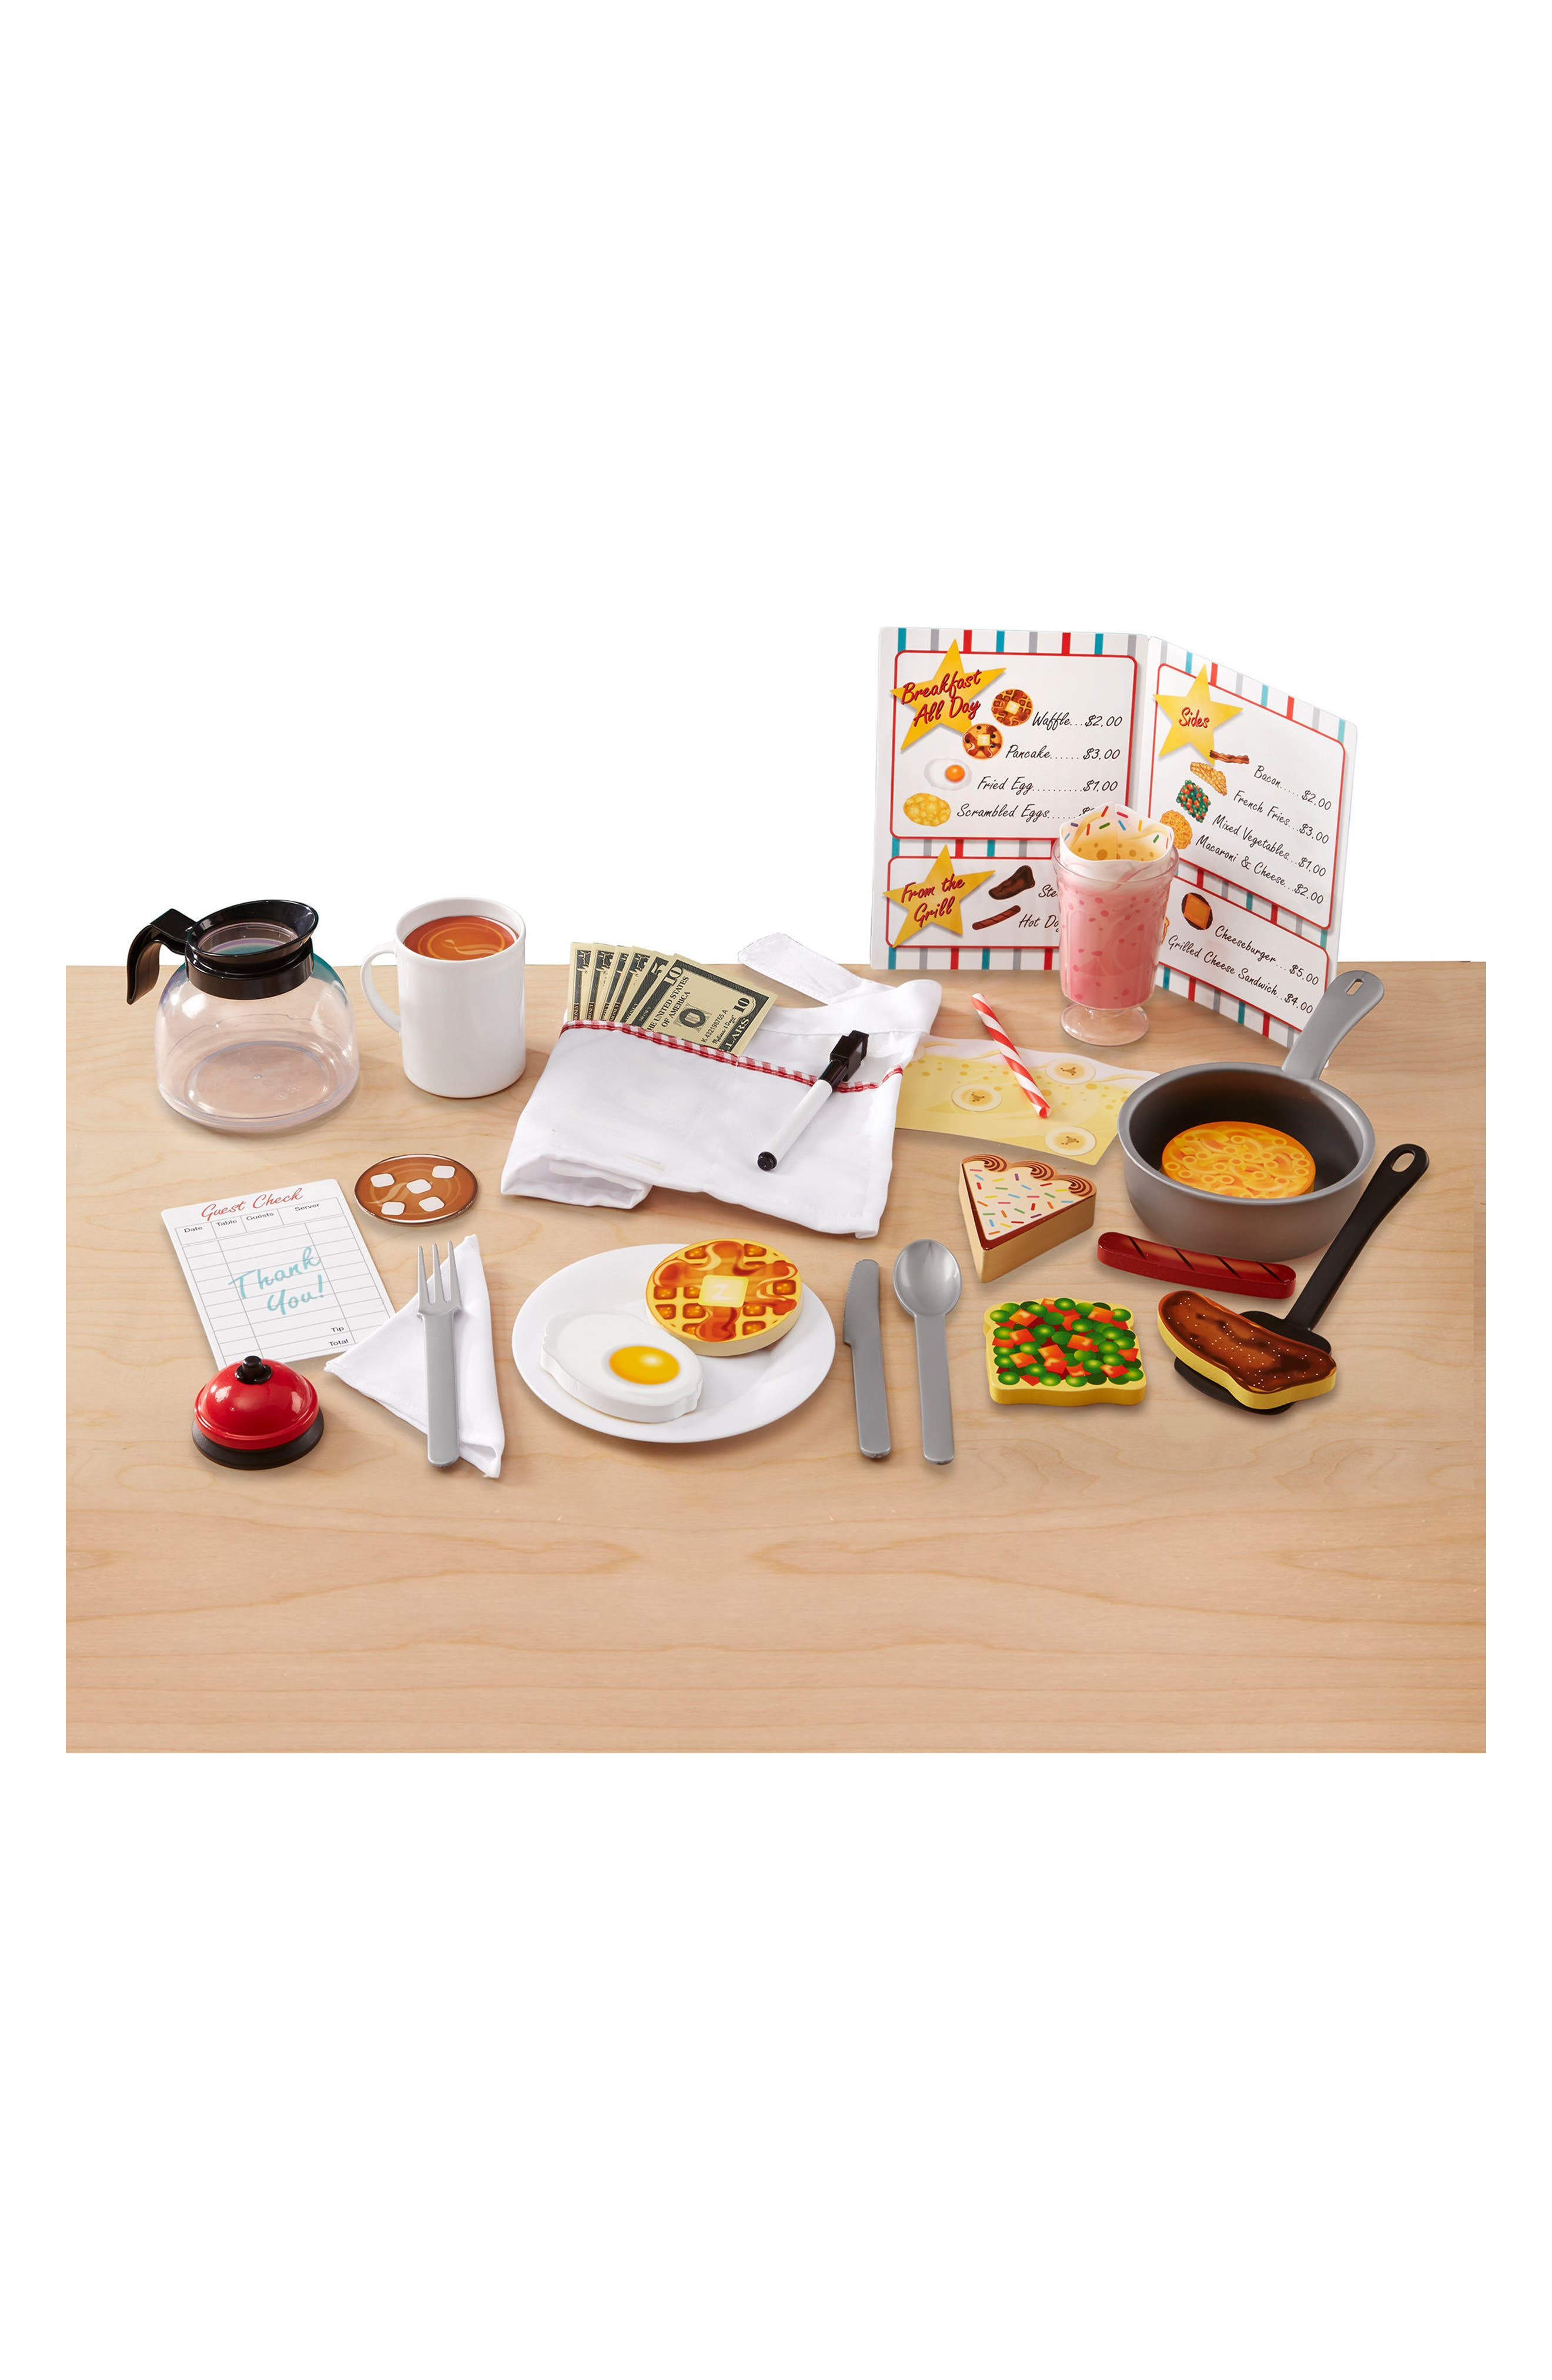 41-Piece Star Diner Restaurant Play Set,                             Alternate thumbnail 4, color,                             WHITE